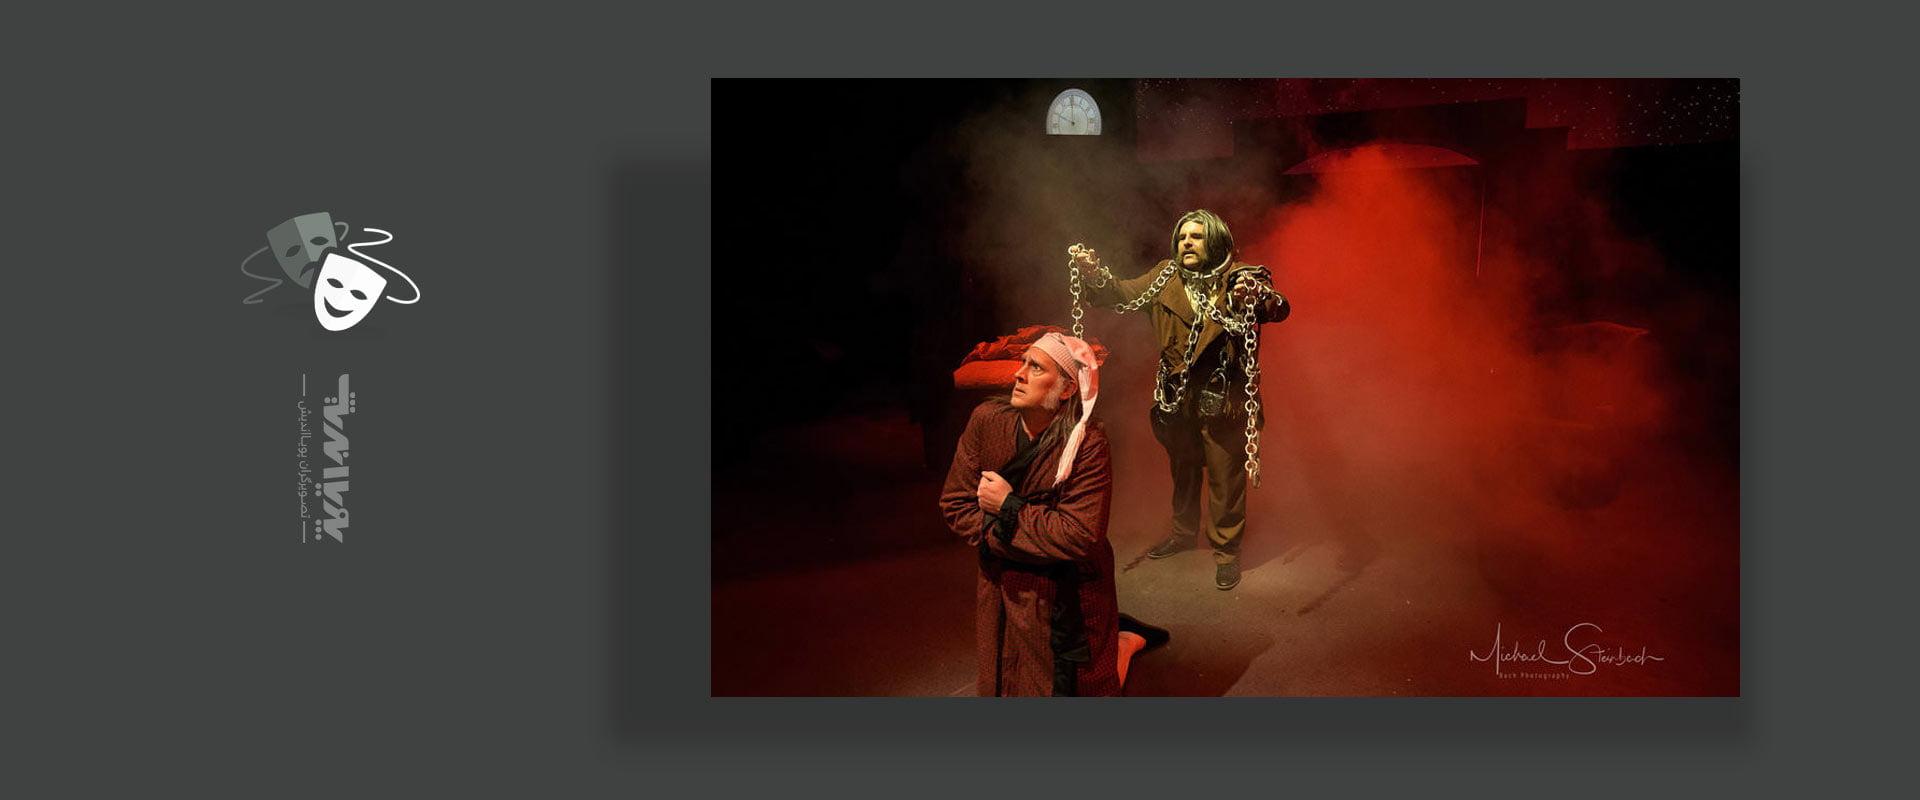 theatre photography 4 - نکات مهم برای عکاسی از تئاتر